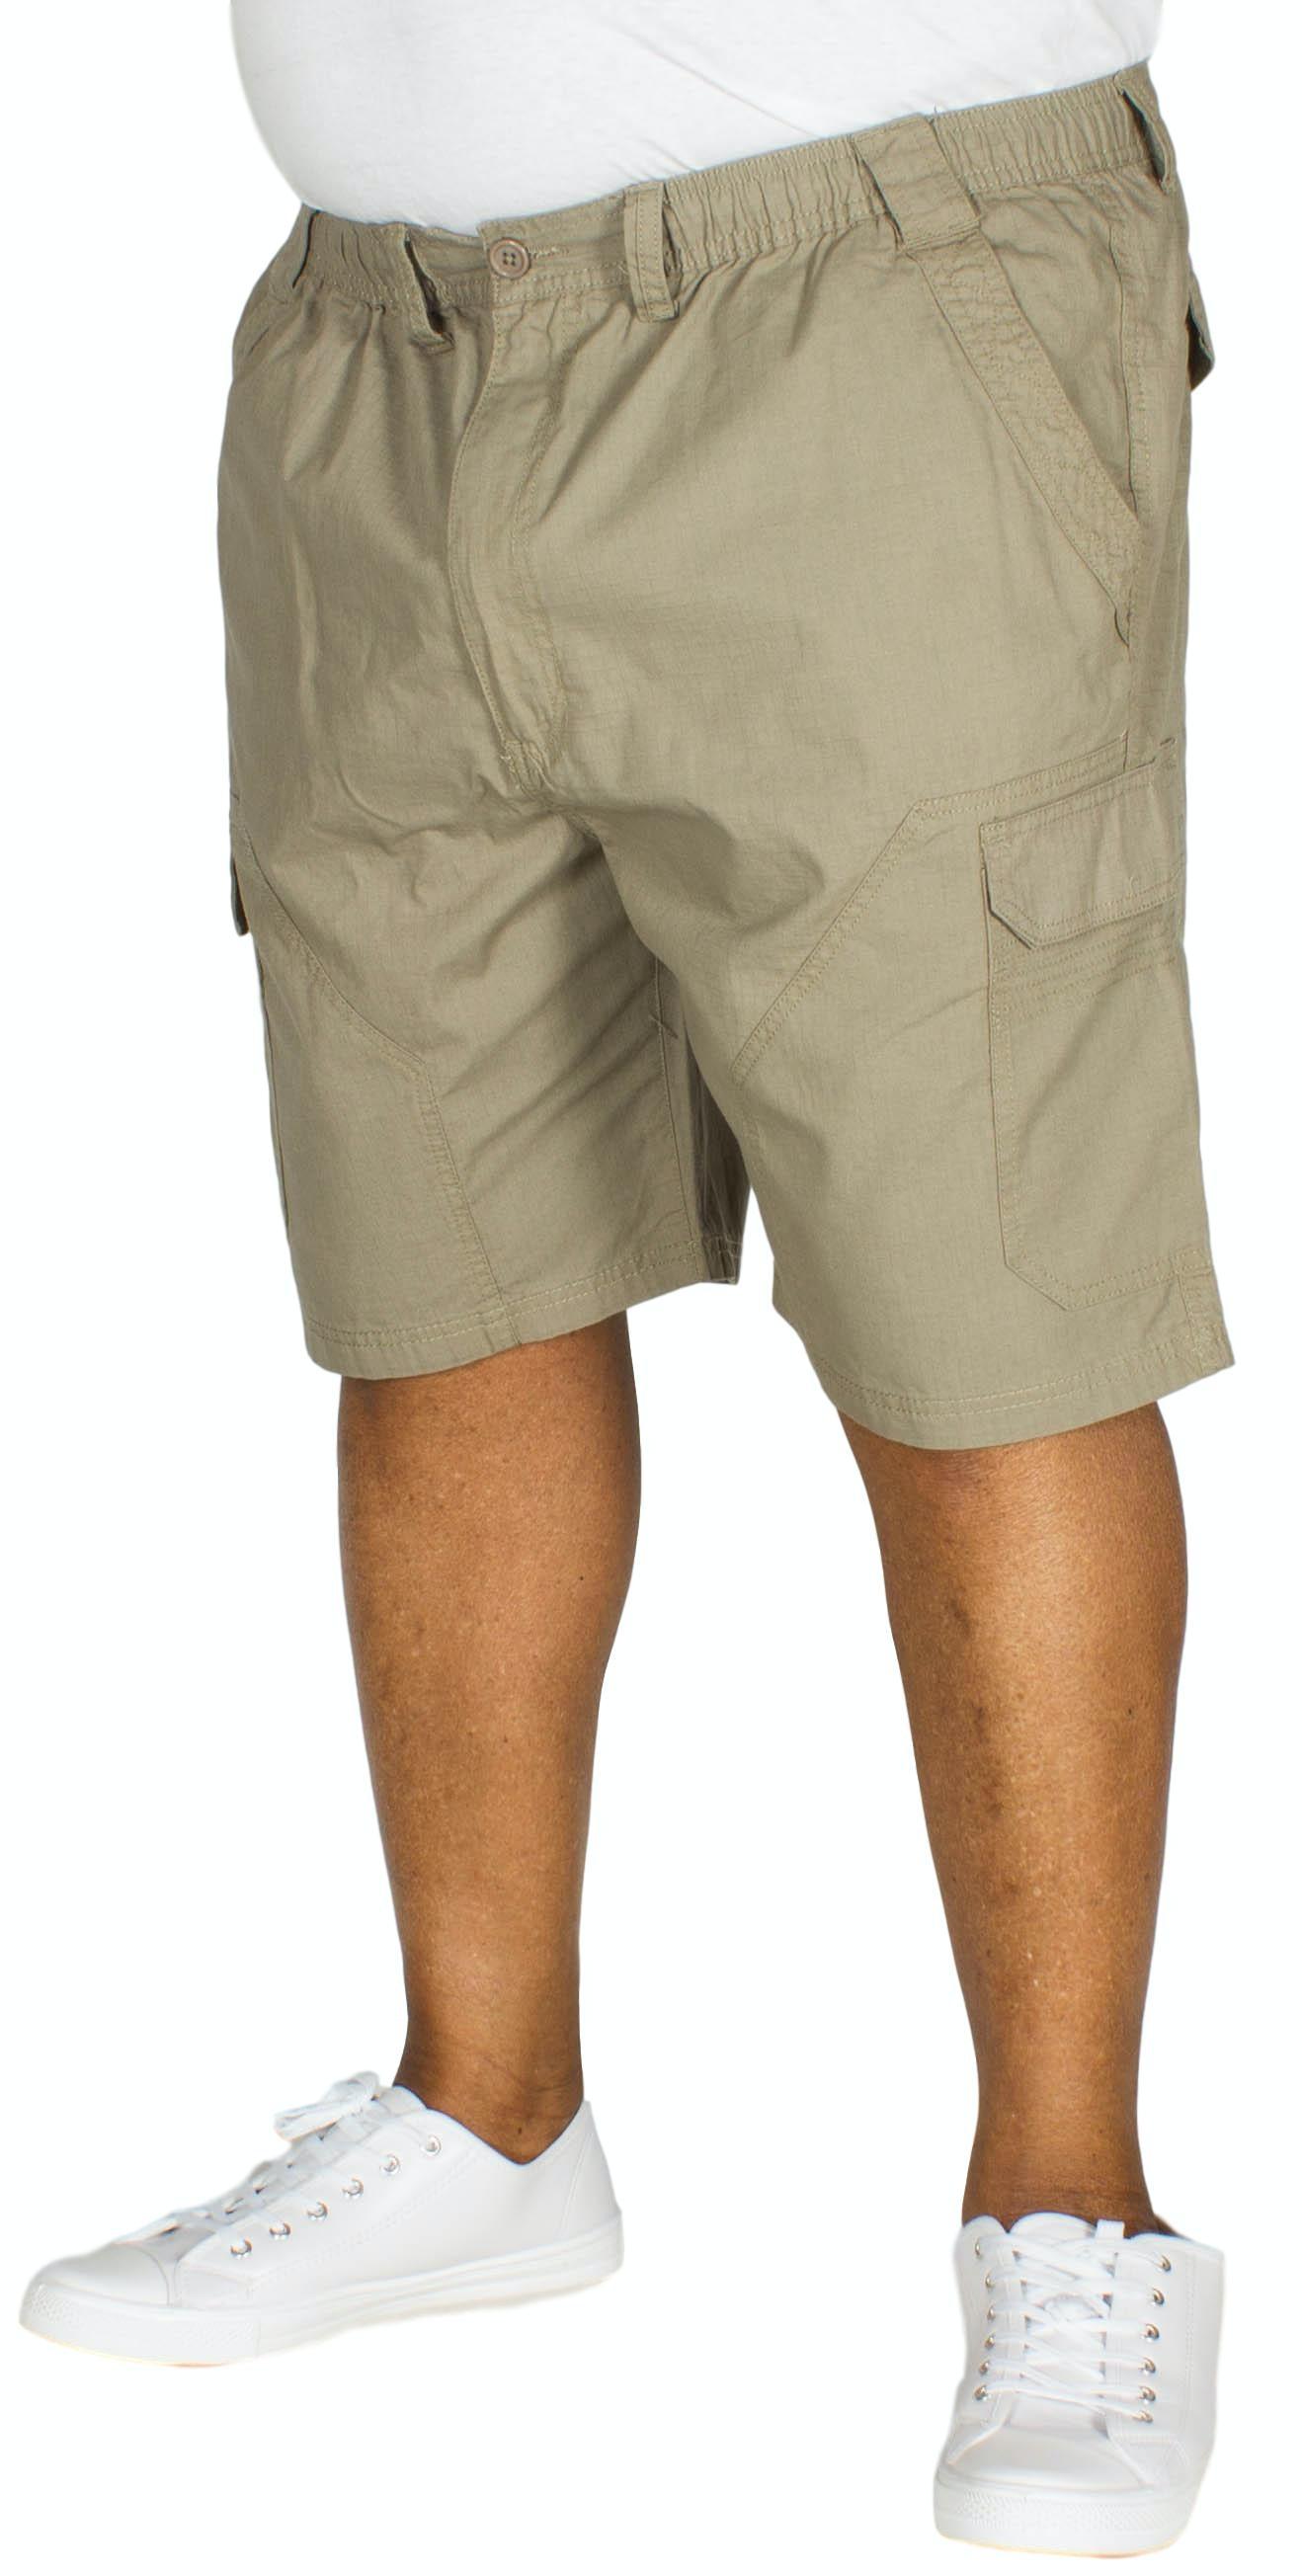 Espionage Ripstop Combat Shorts Olive